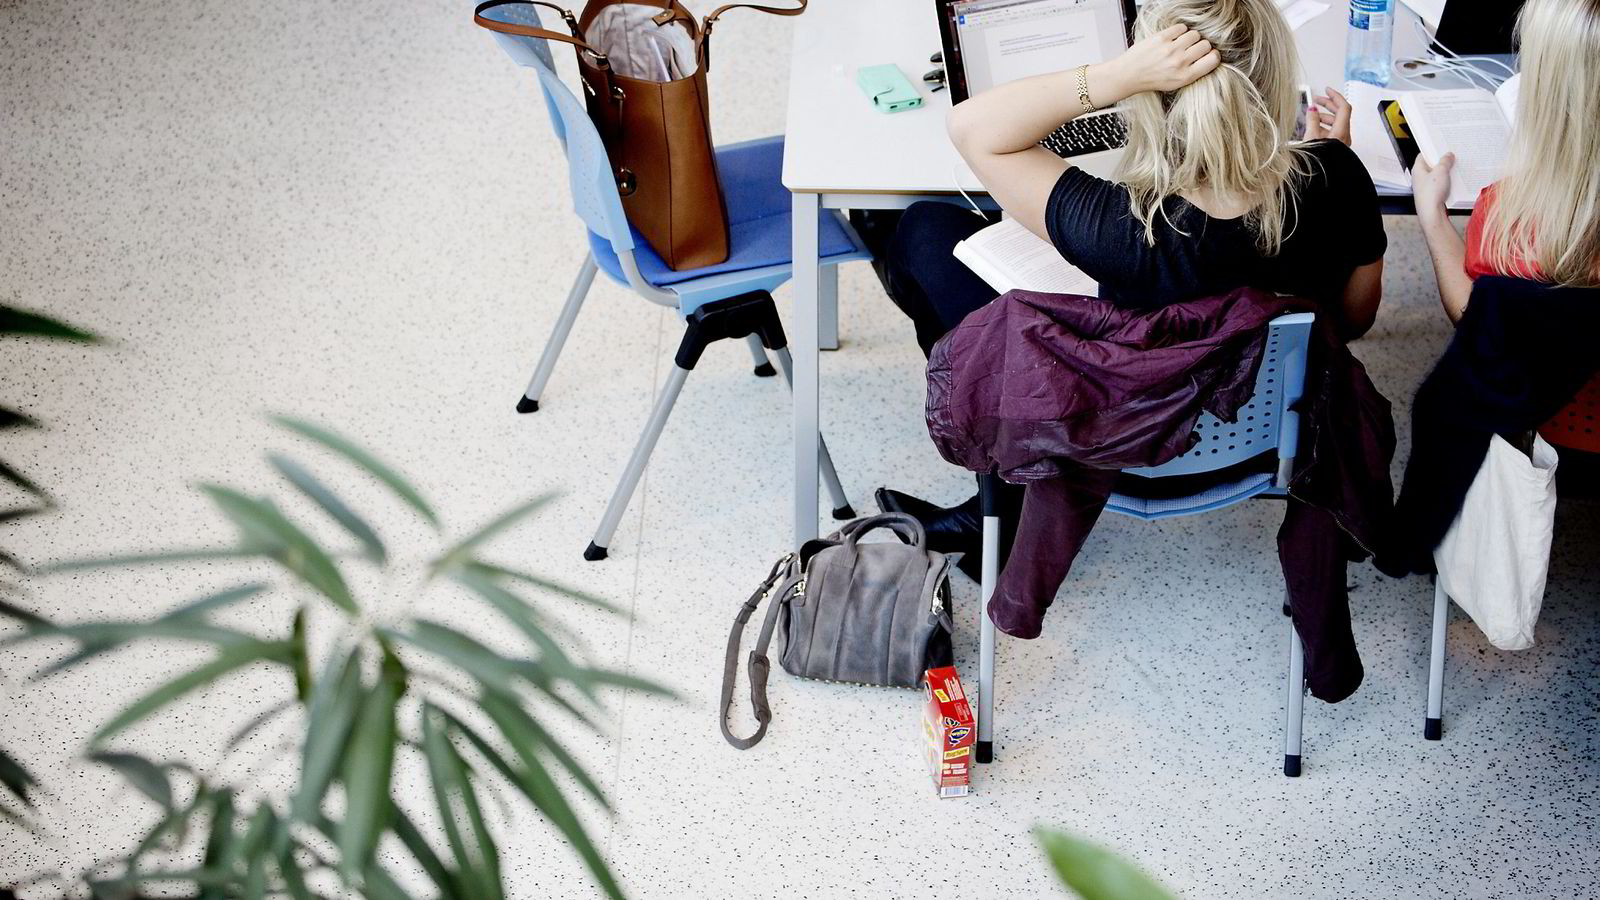 Studiestøtten må økes, mener NSO. Foto: Ida von Hanno Bast